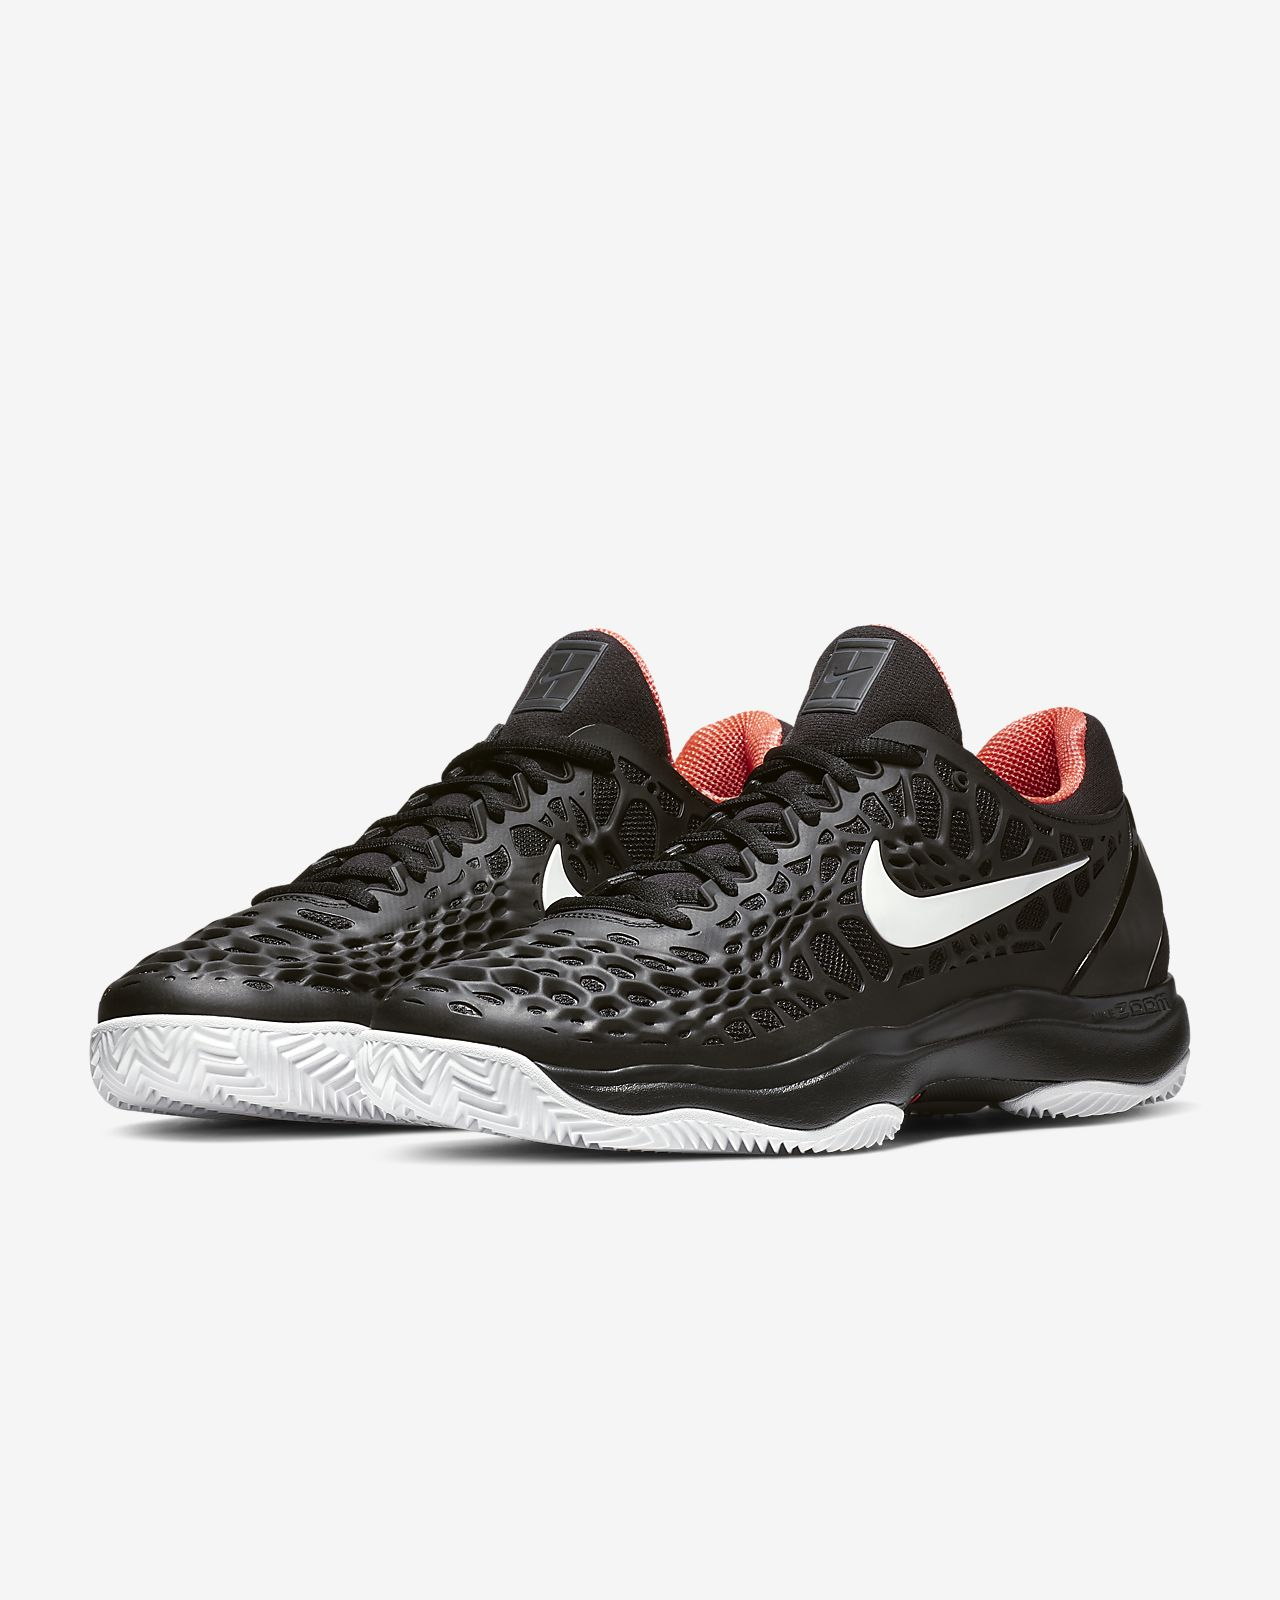 3553eaec4624 Nike Zoom Cage 3 Clay Men s Tennis Shoe. Nike.com CA